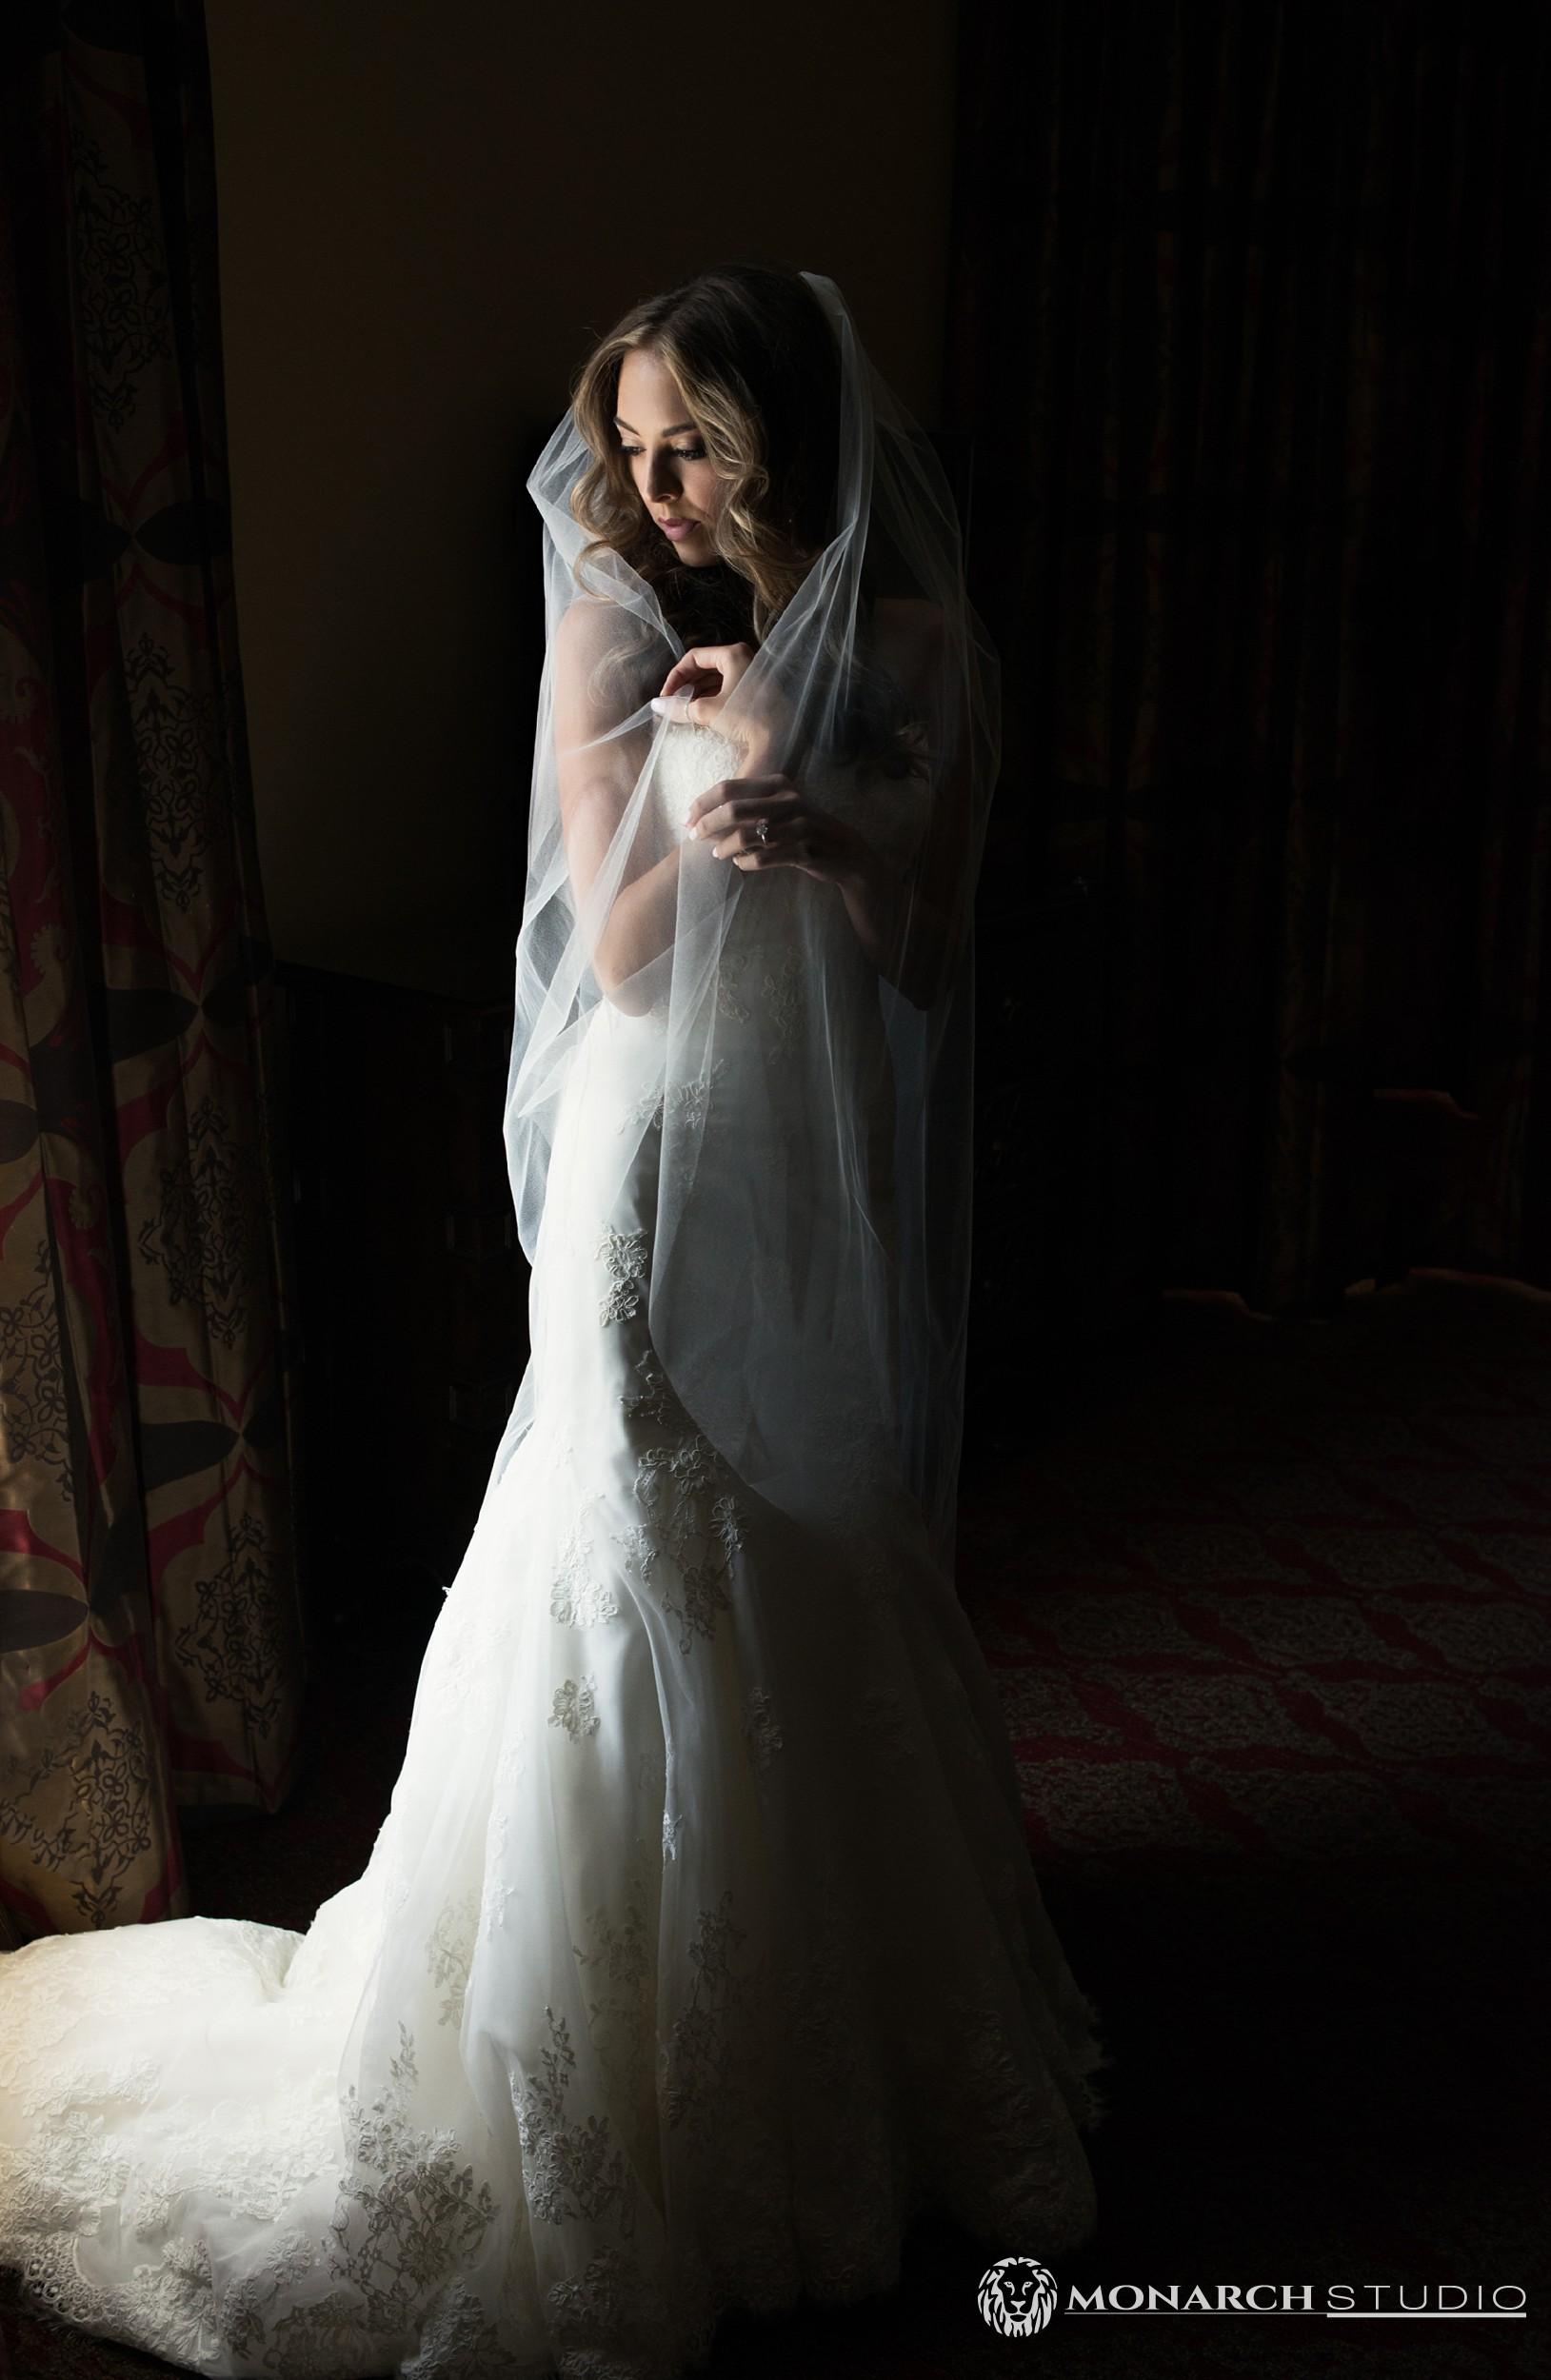 St. Augustine Wedding portrait of a bride at the Casa Monica Hotel.